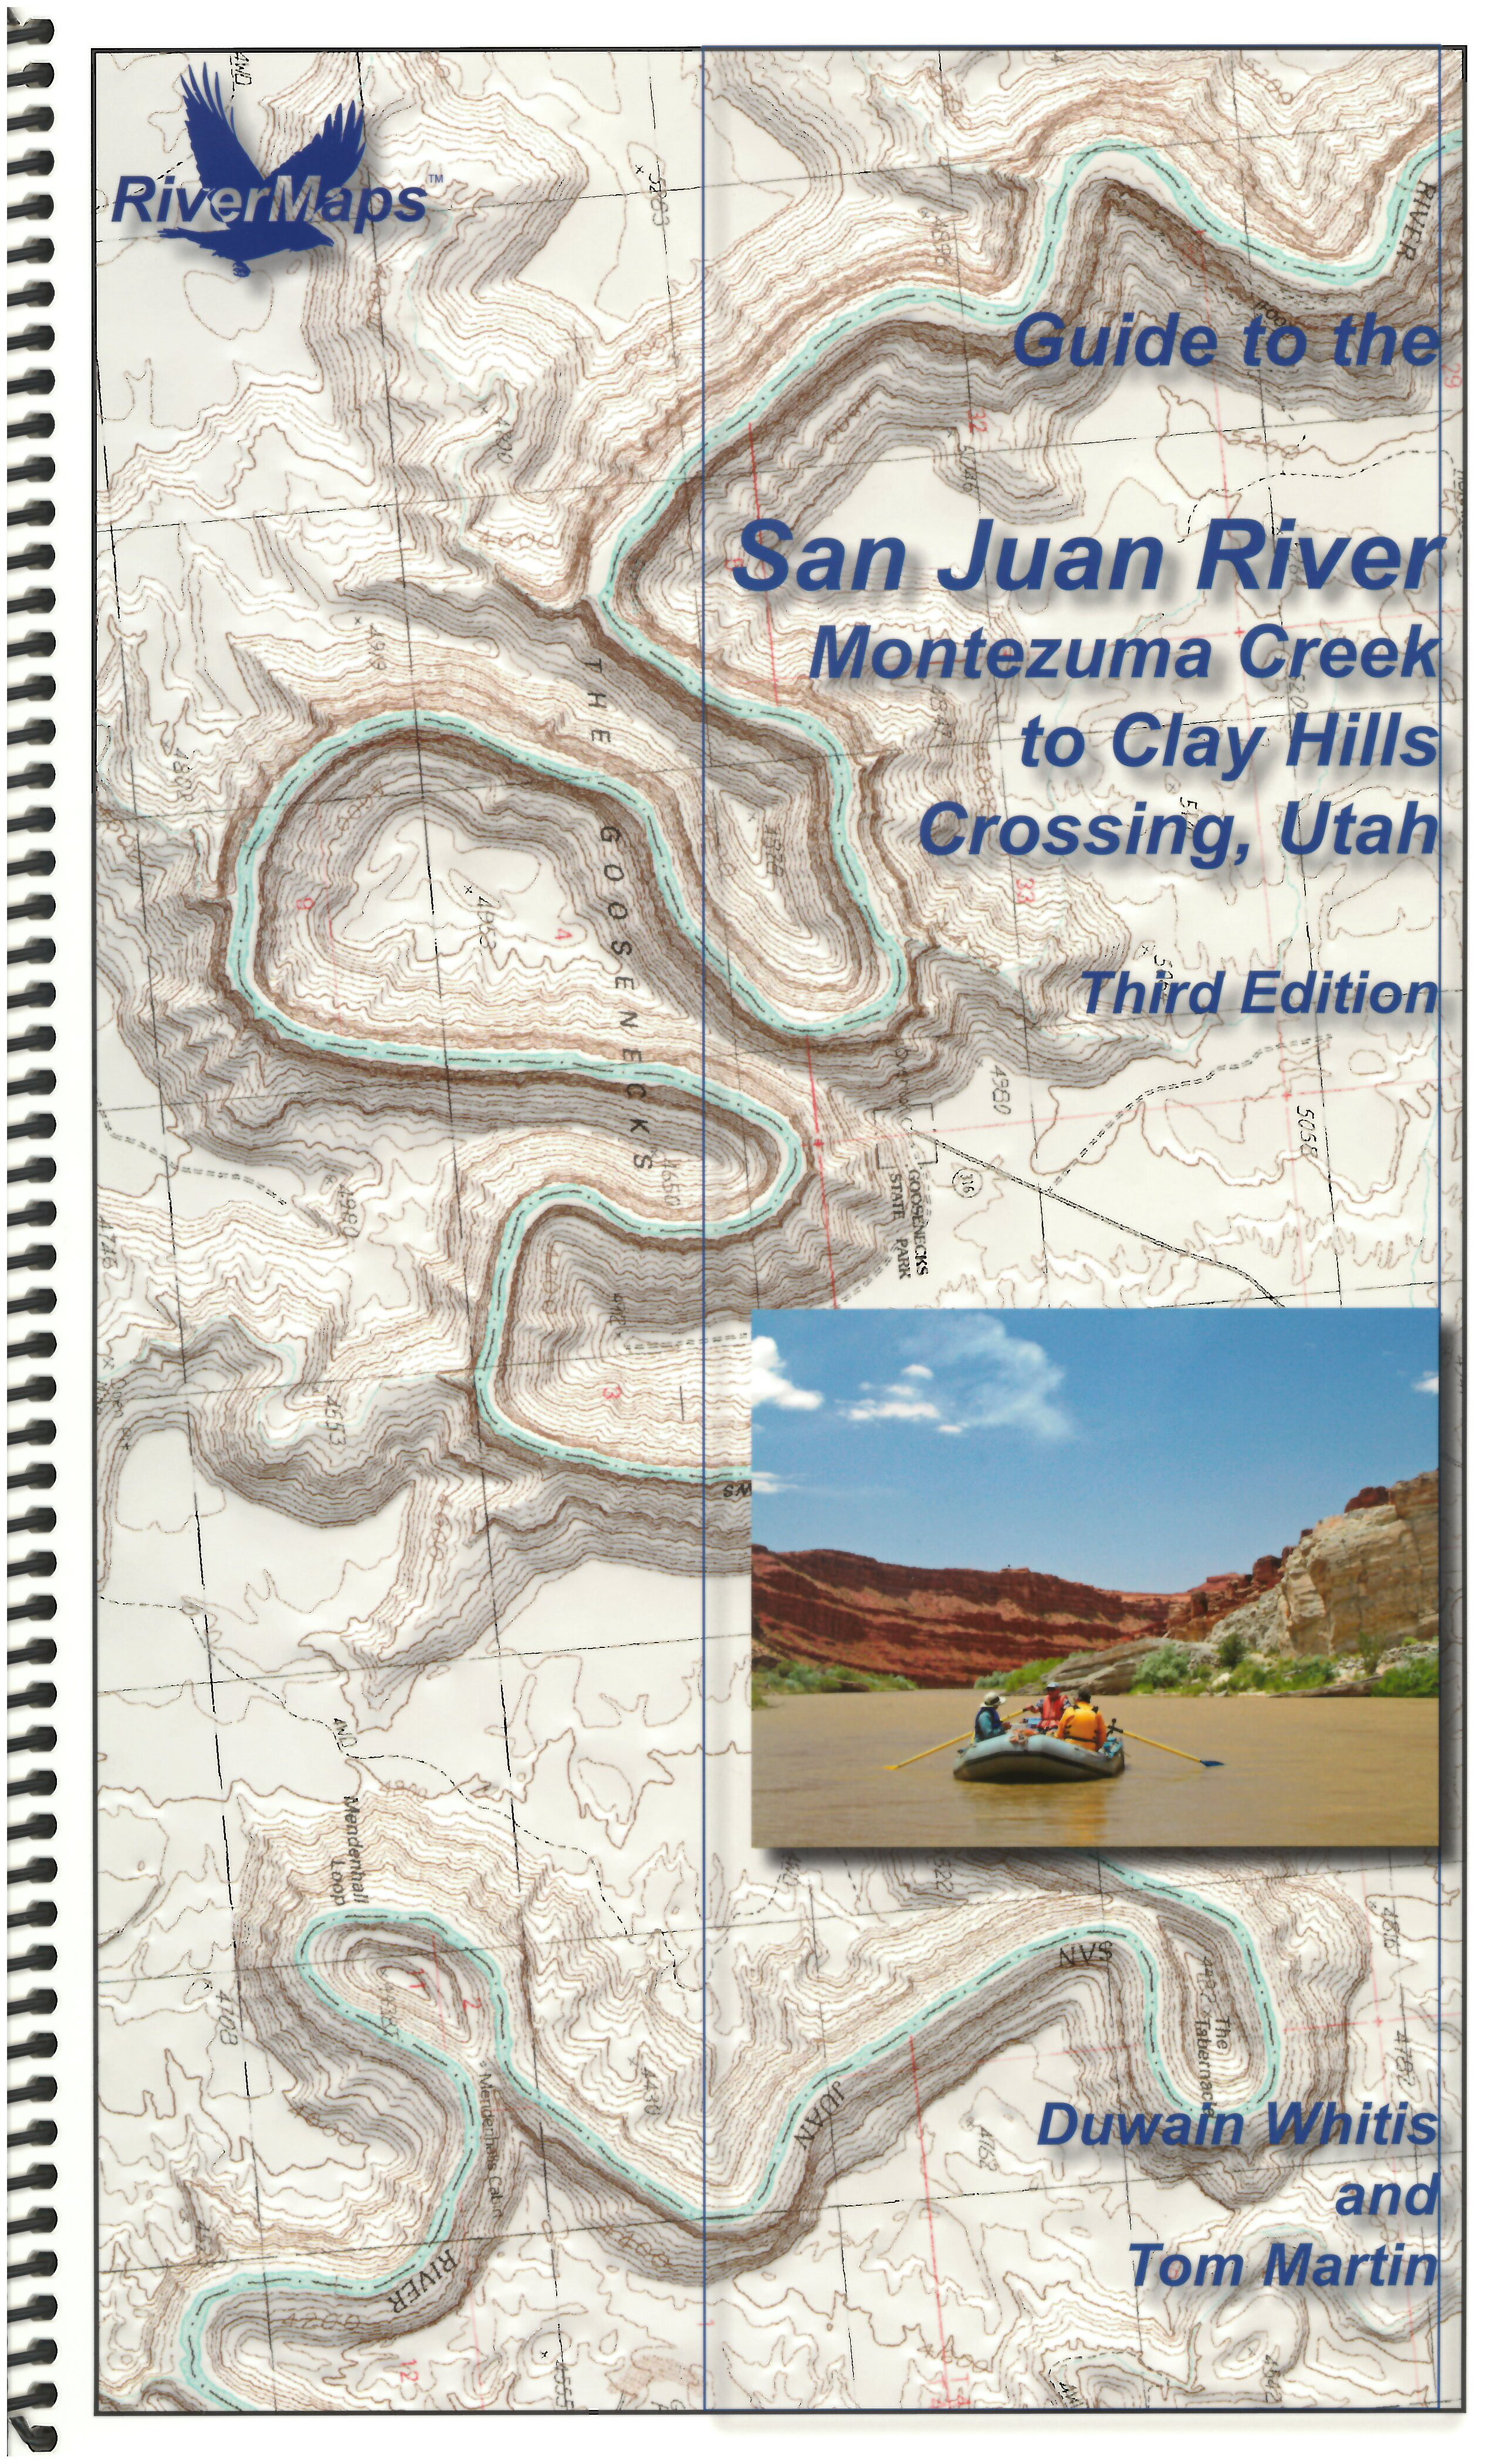 RiverMaps San Juan River 3rd Edition Guide Book